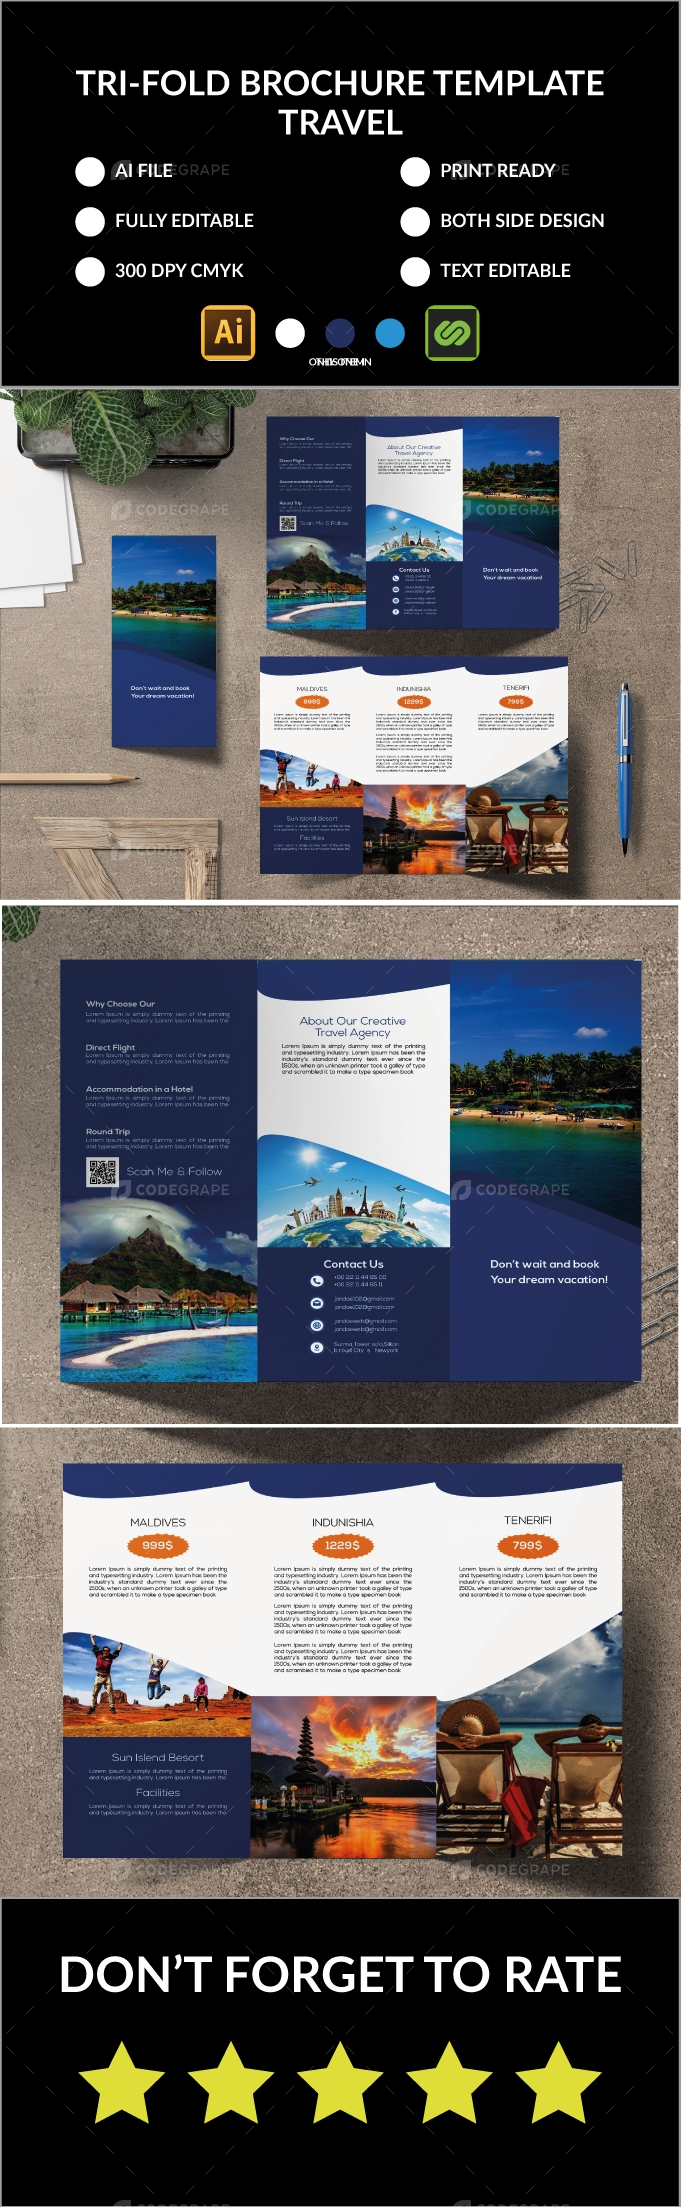 Tri-Fold Brochure Travel